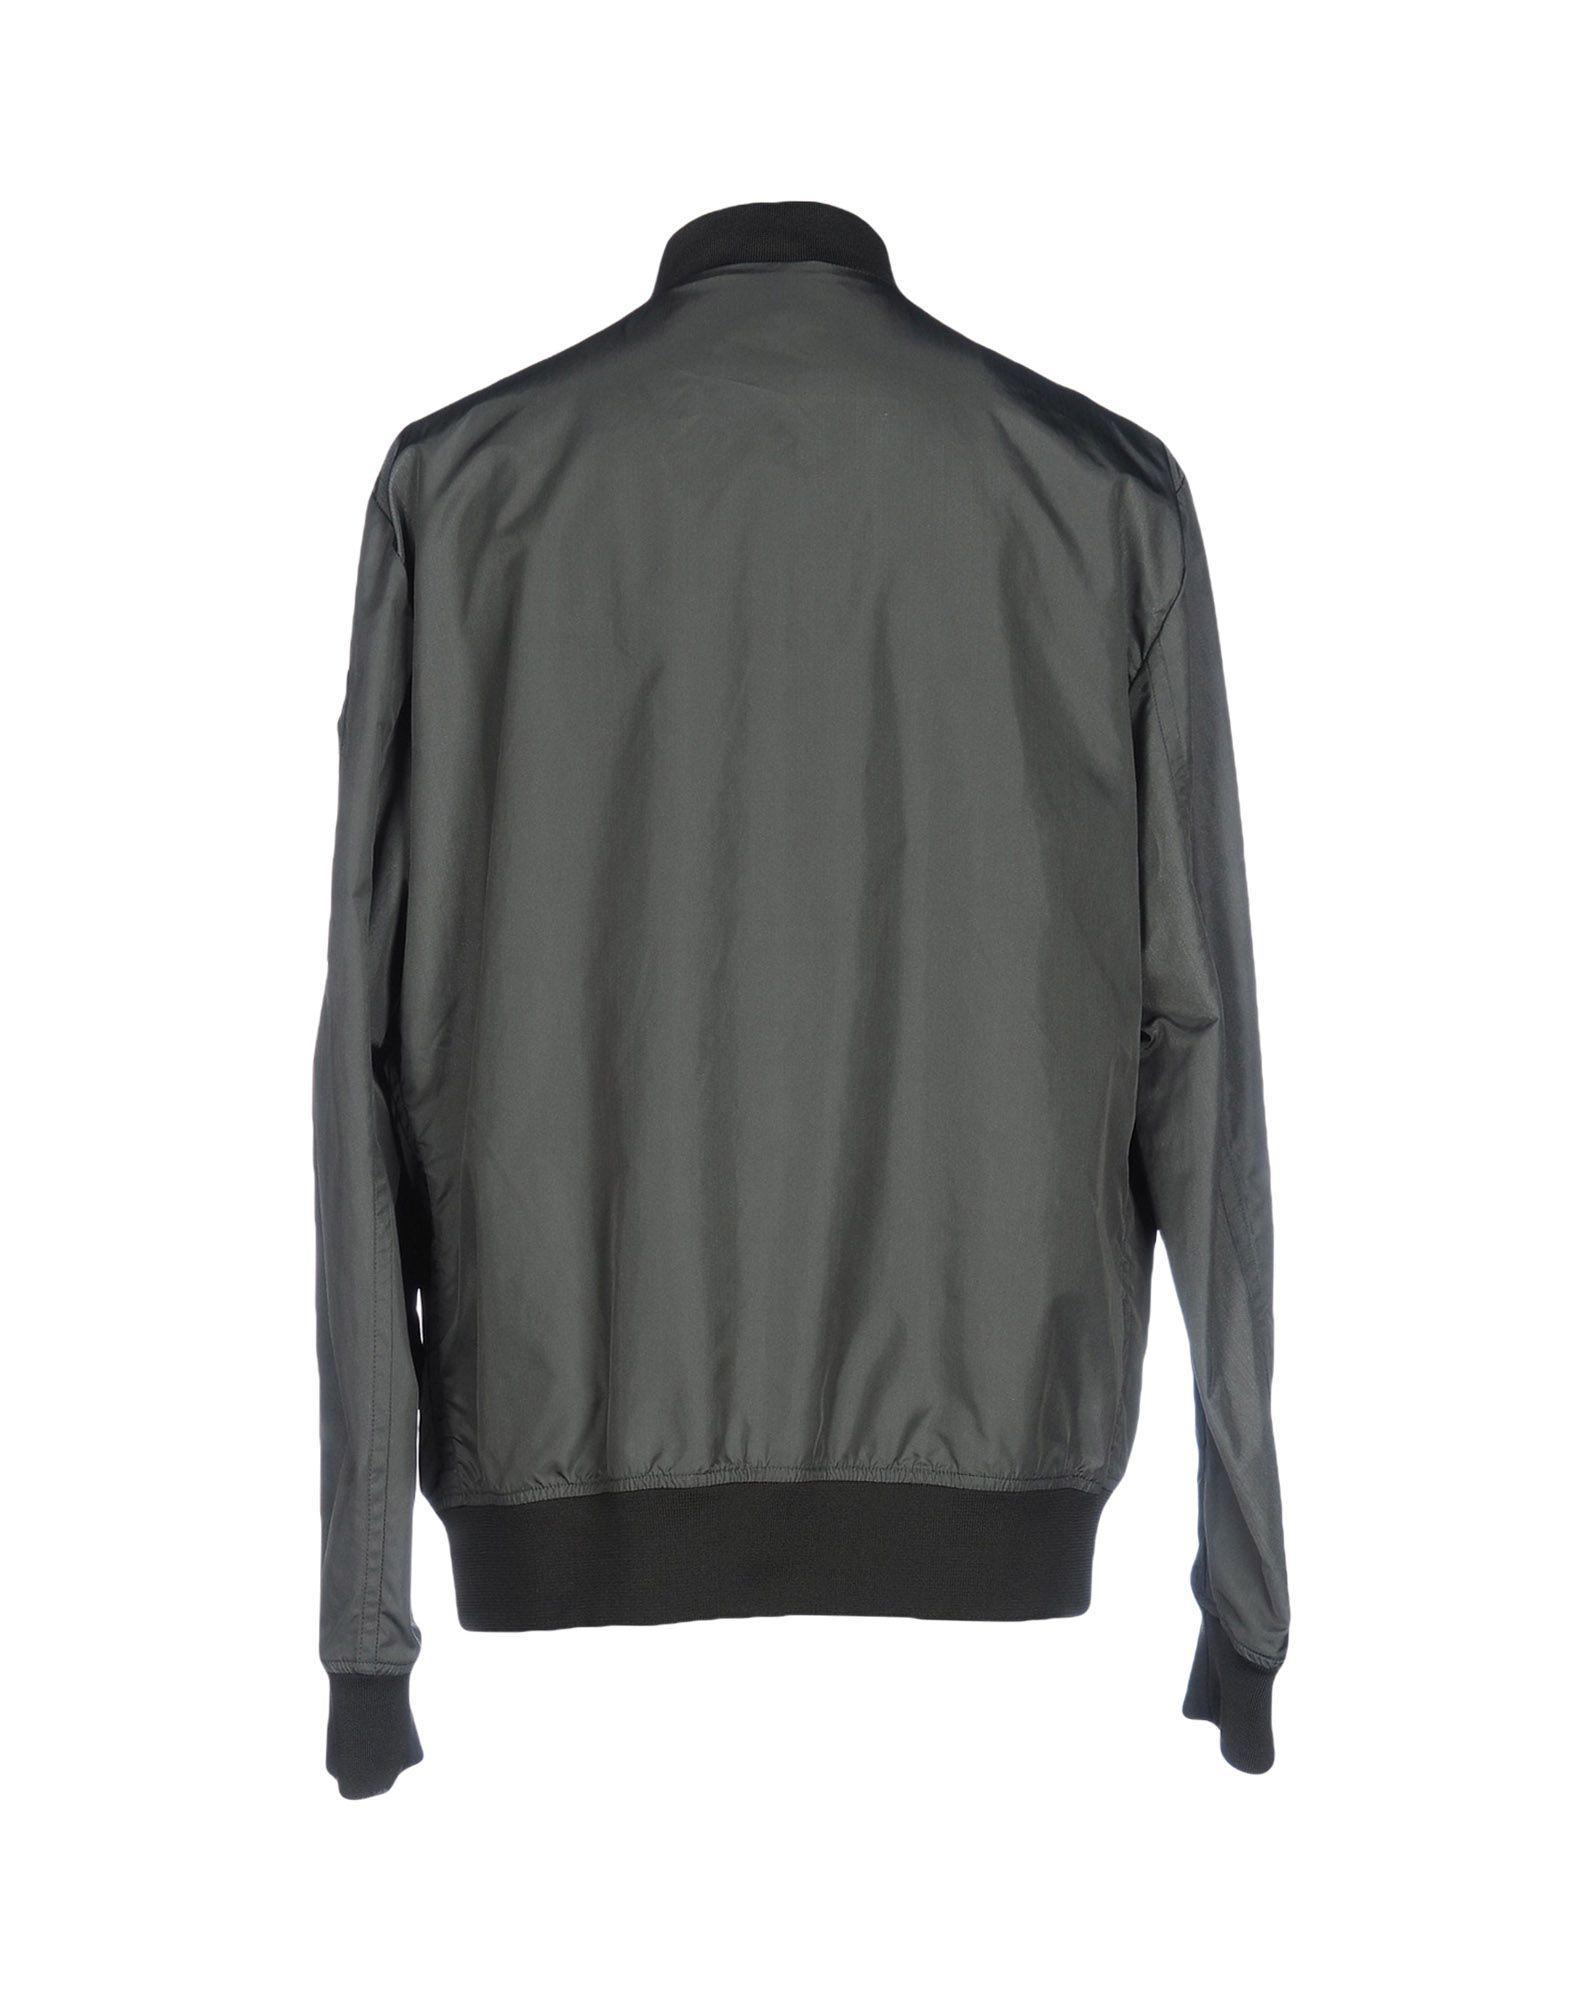 Dekker Synthetic Jacket in Military Green (Green) for Men